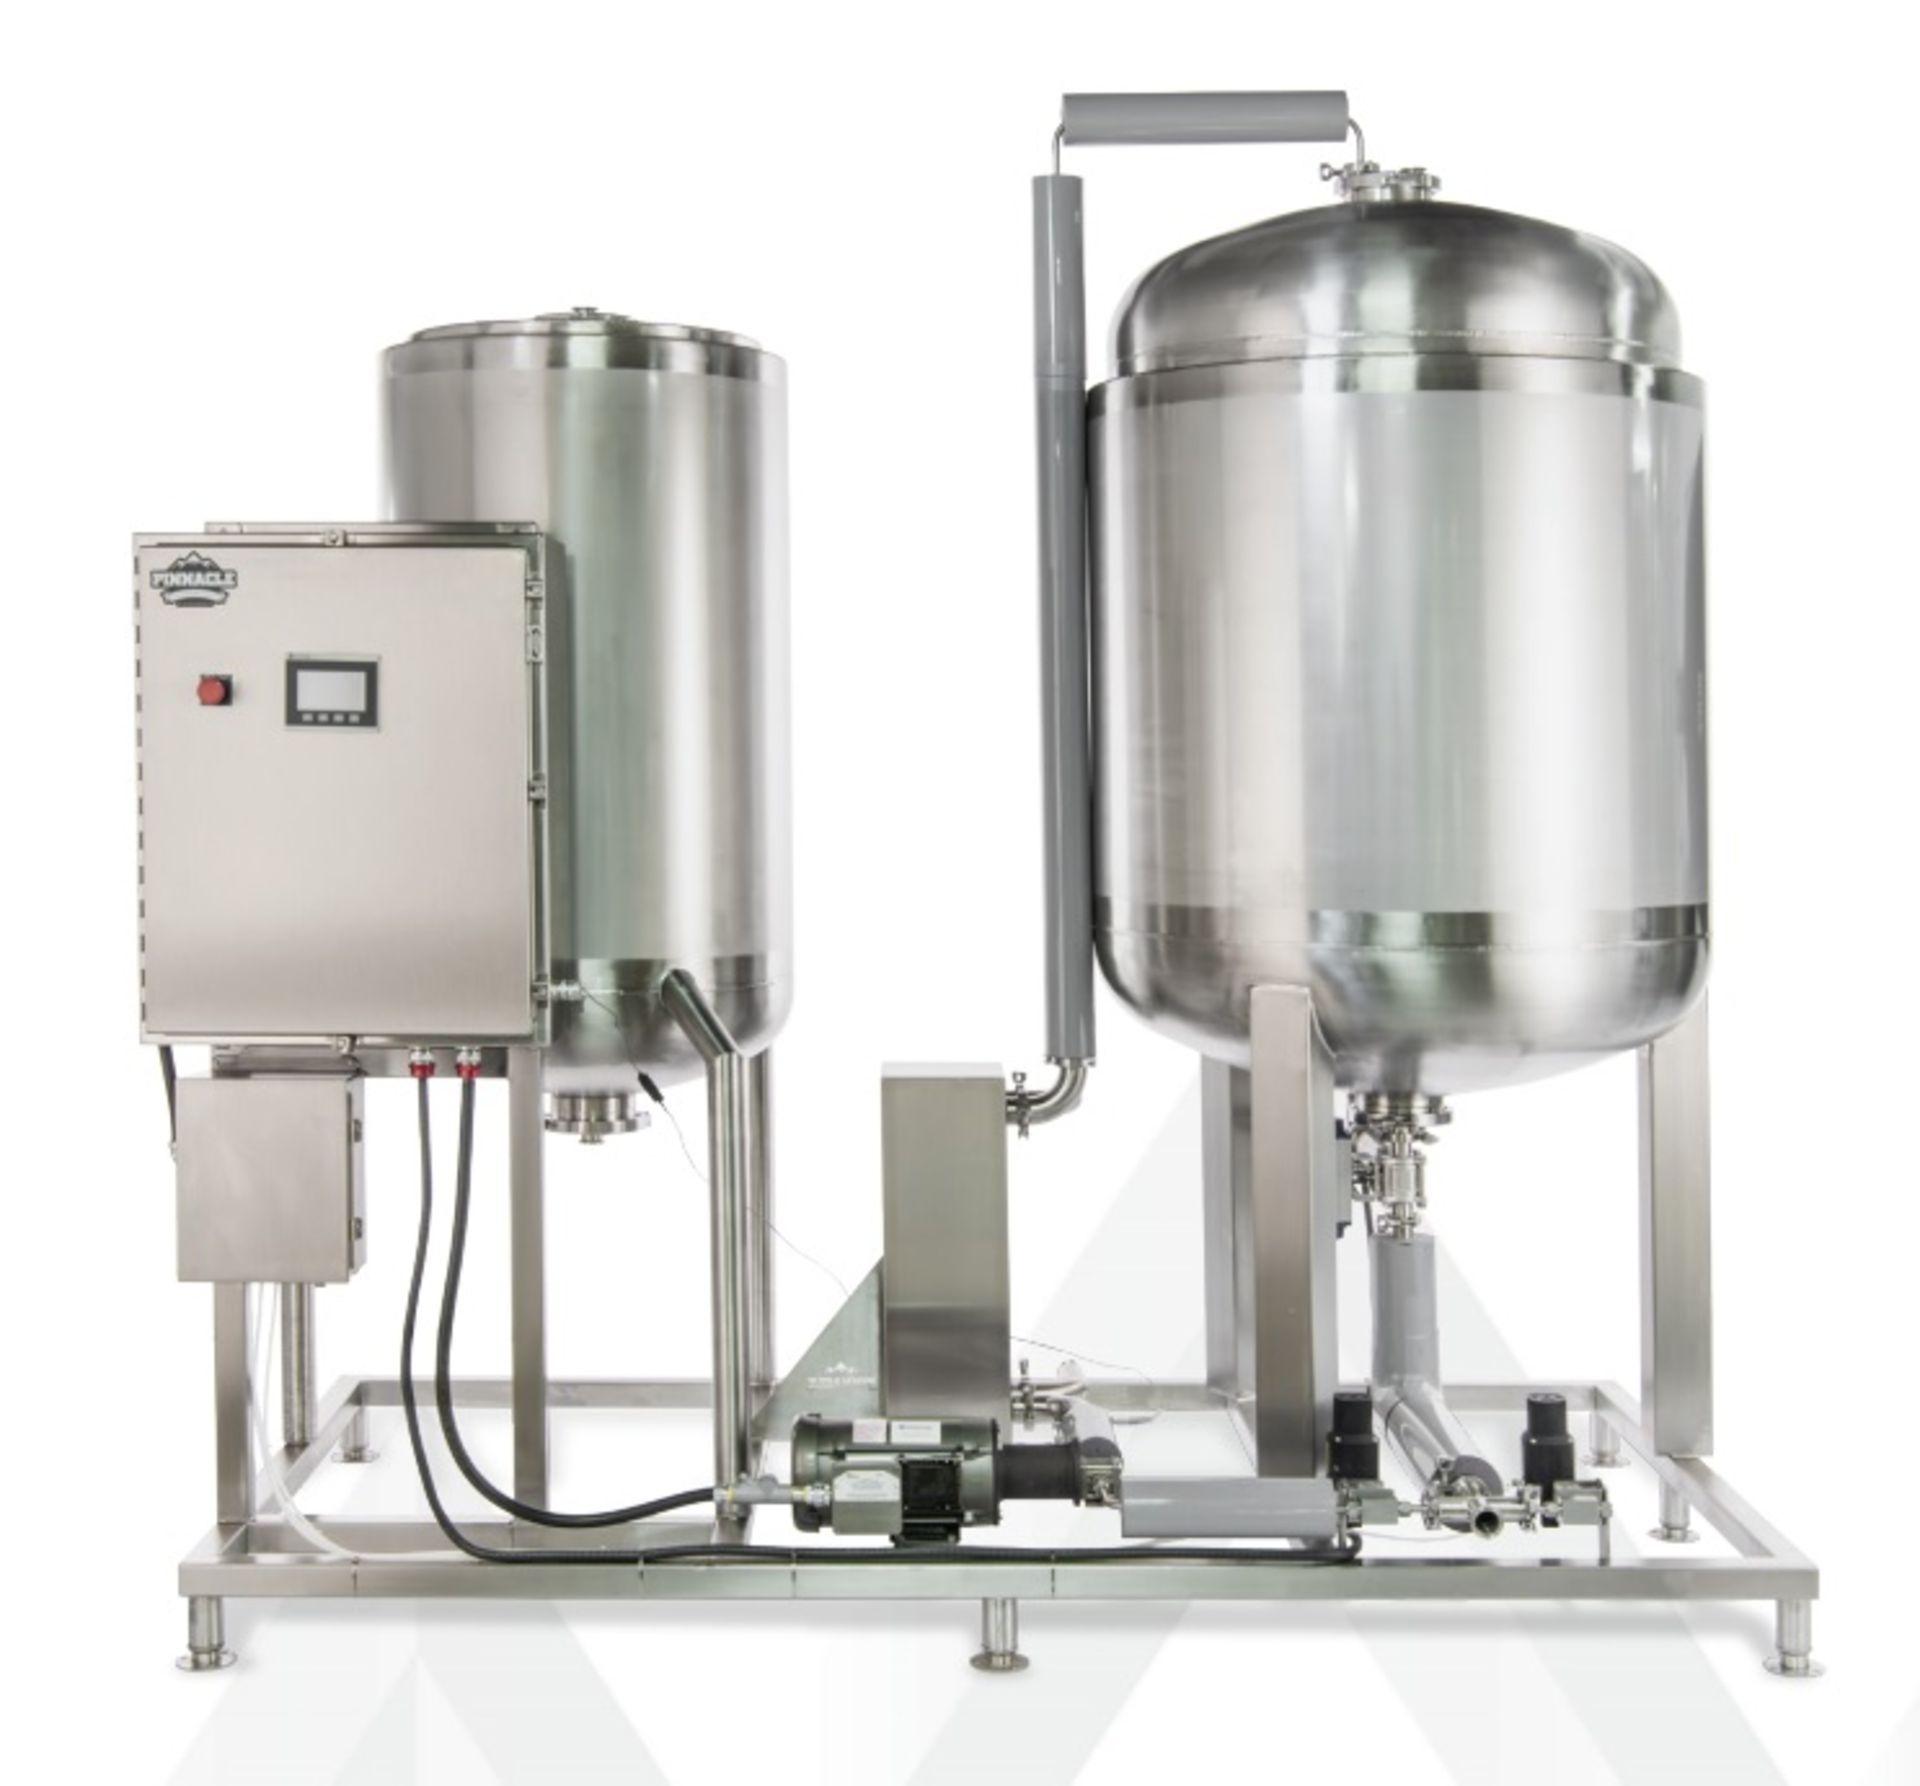 Unused- Pinnacle 40 Degrees C Ethanol System w/ ICS Skid, G&D Model 14-2LC, Huber CC-902